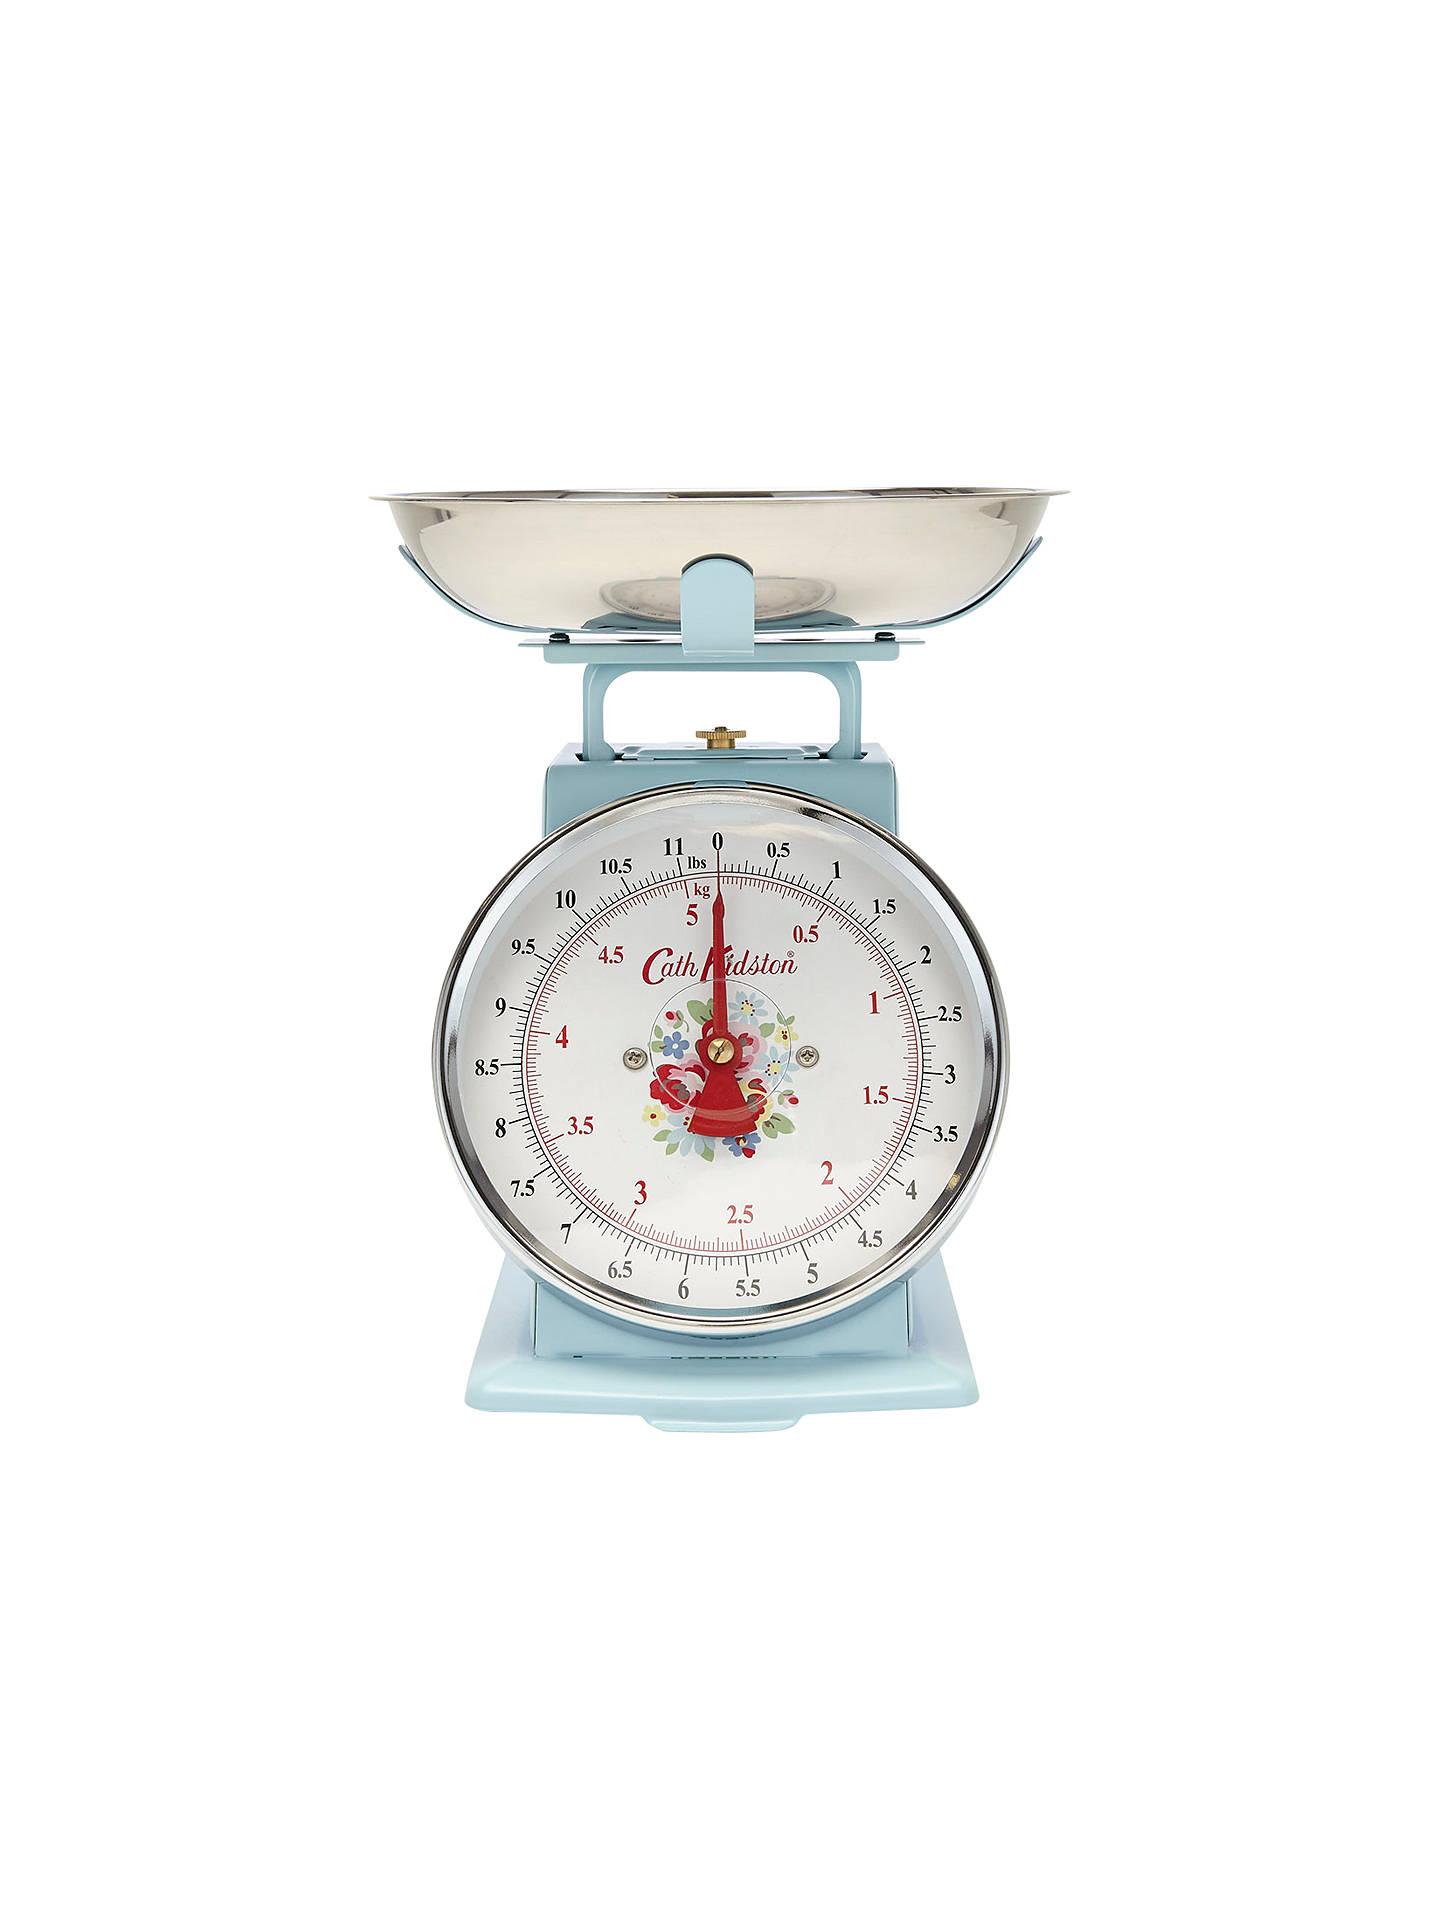 Cath Kidston Kitchen Scale 5kg At John Lewis Partners